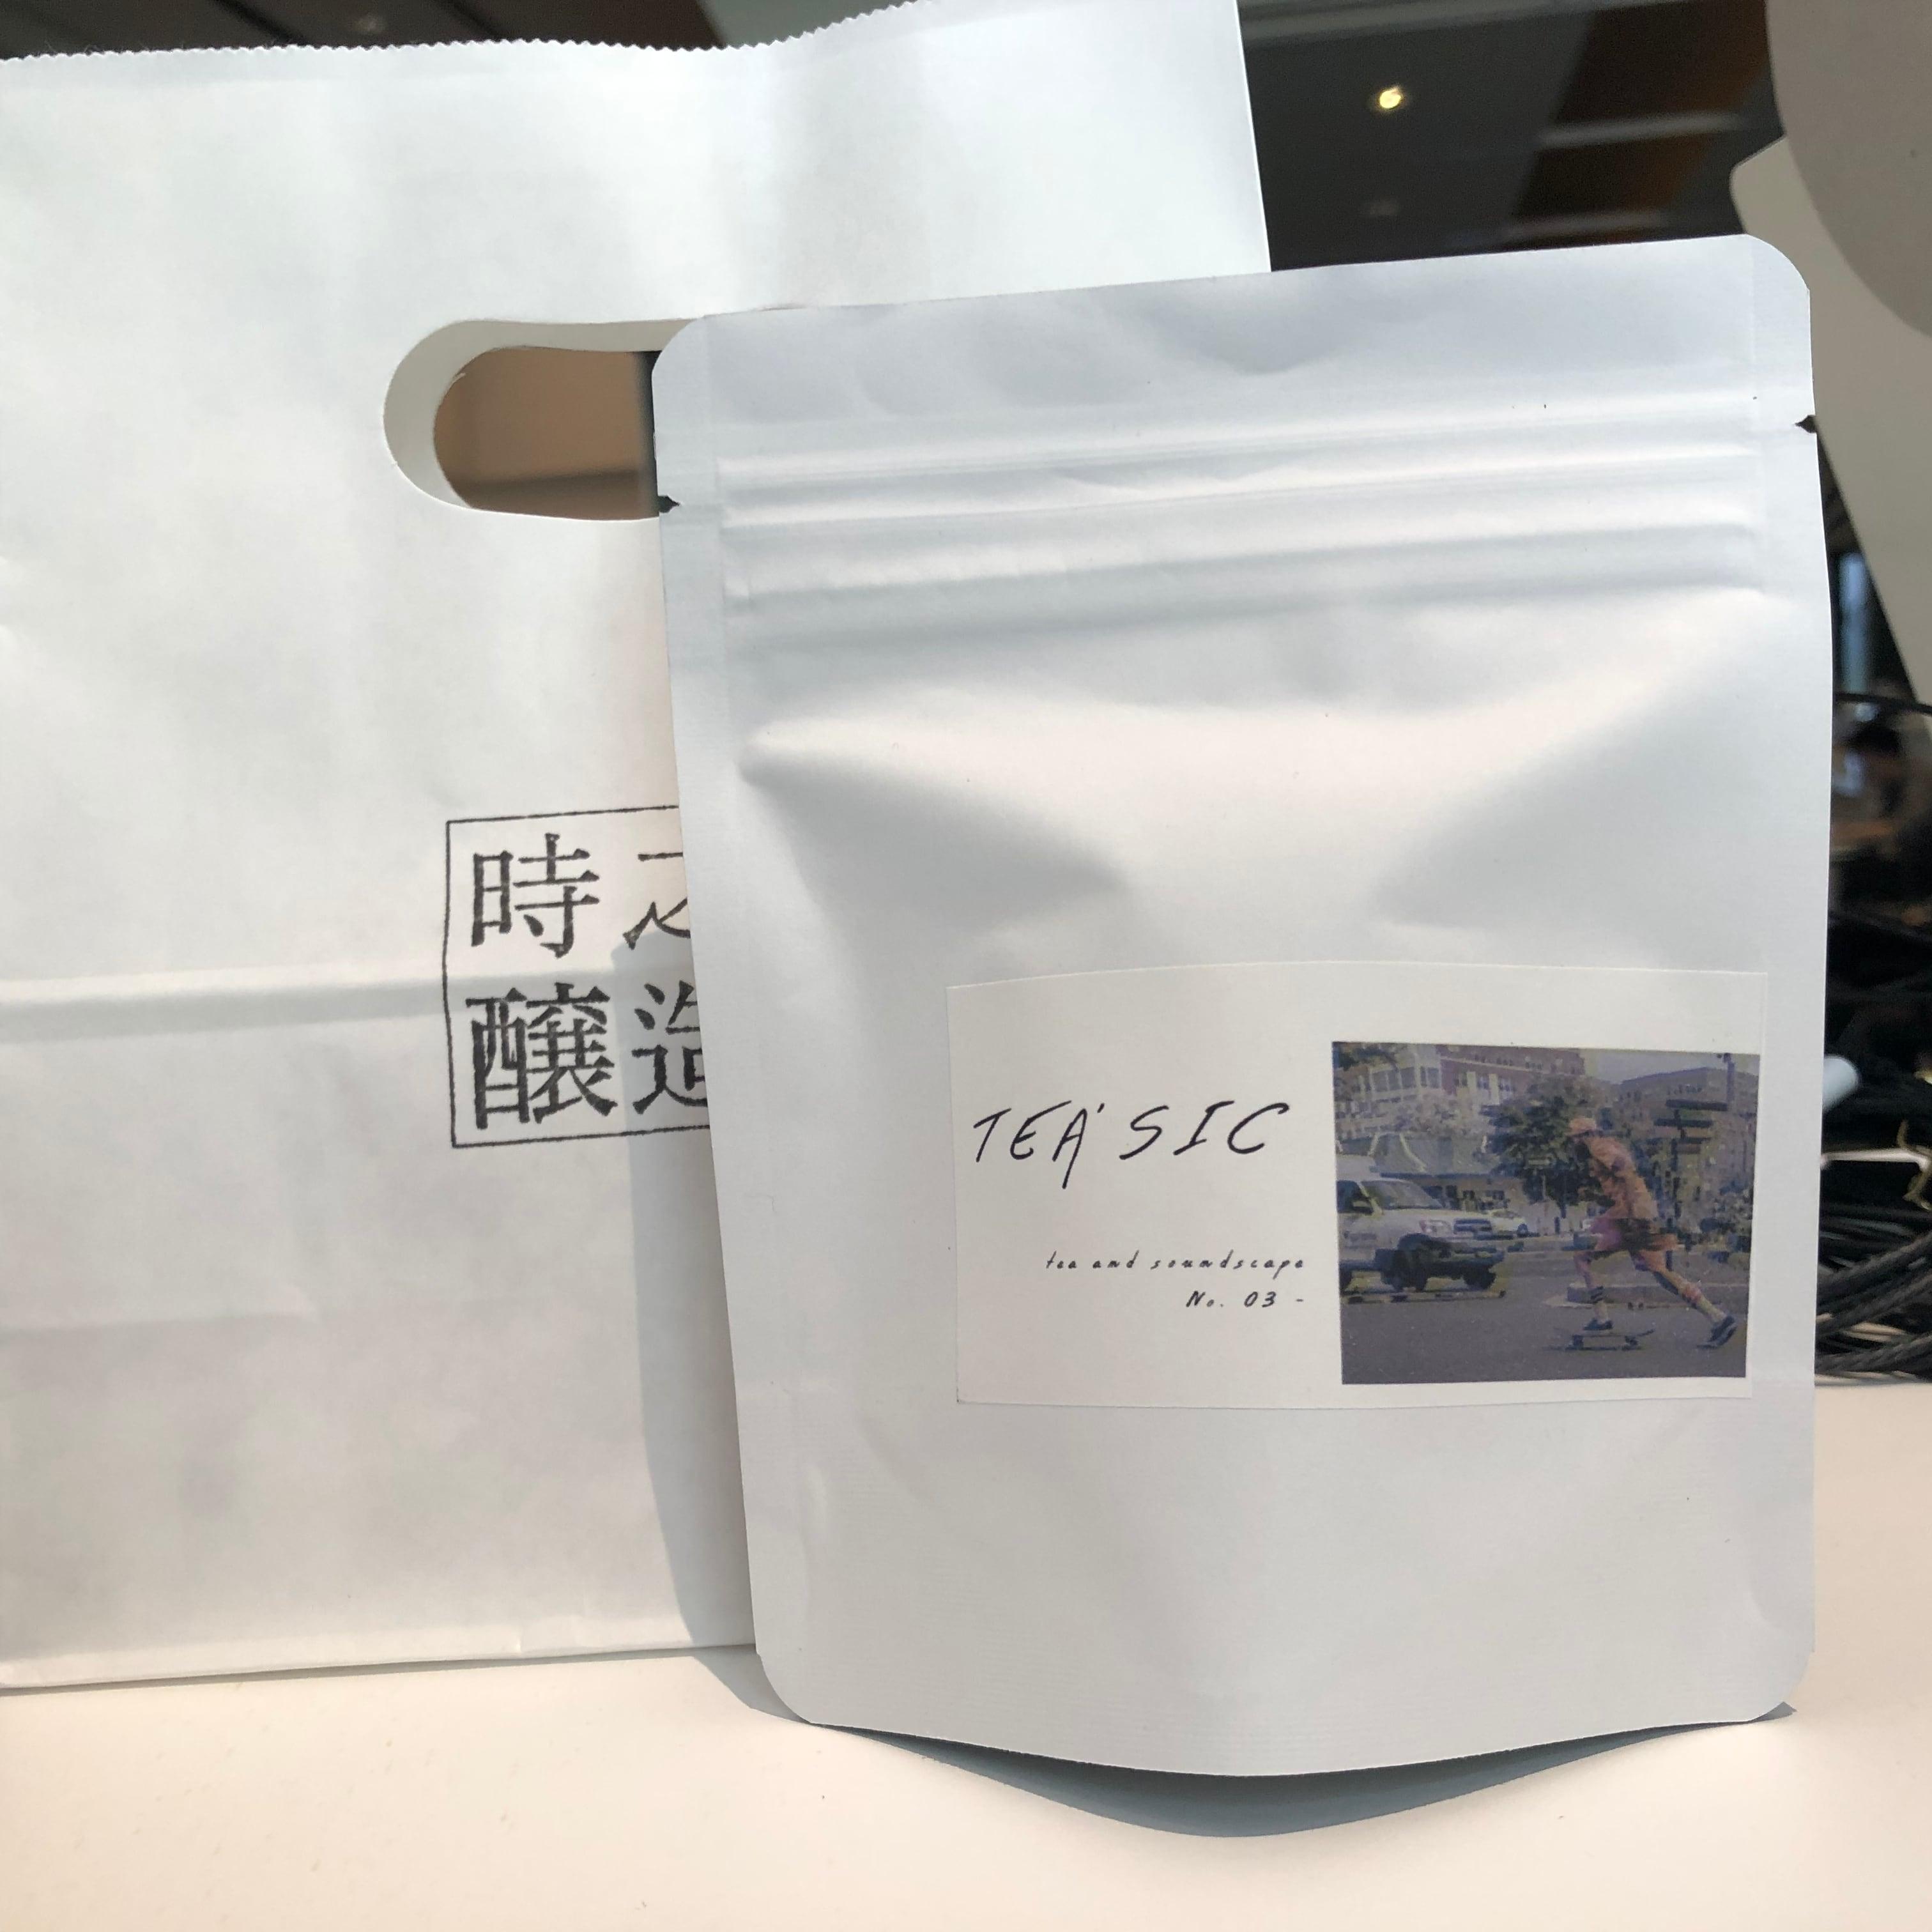 【5pc入り】味わいの音楽付き日本茶TEA'SIC NO.03